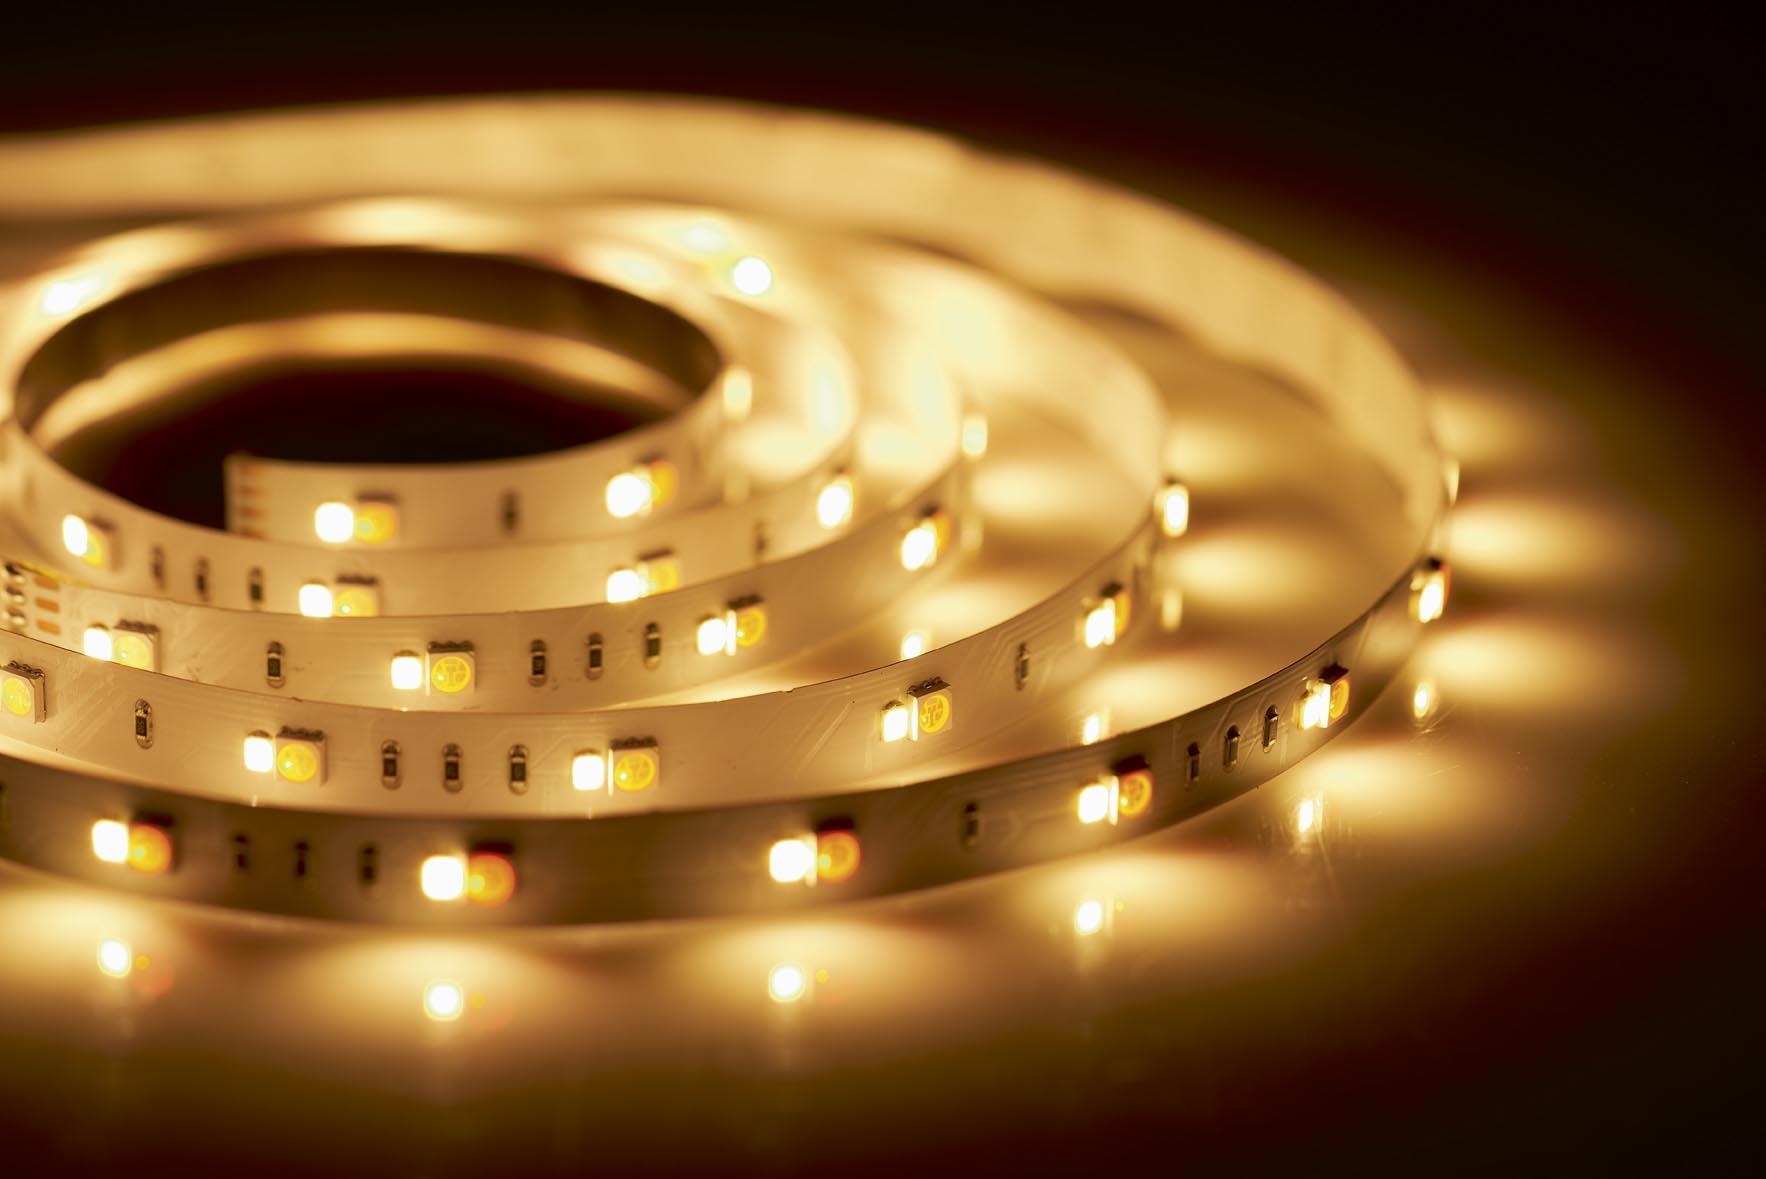 Cheer led strip sylvania lighting solutions cheer led strip product image for 0053255 aloadofball Choice Image